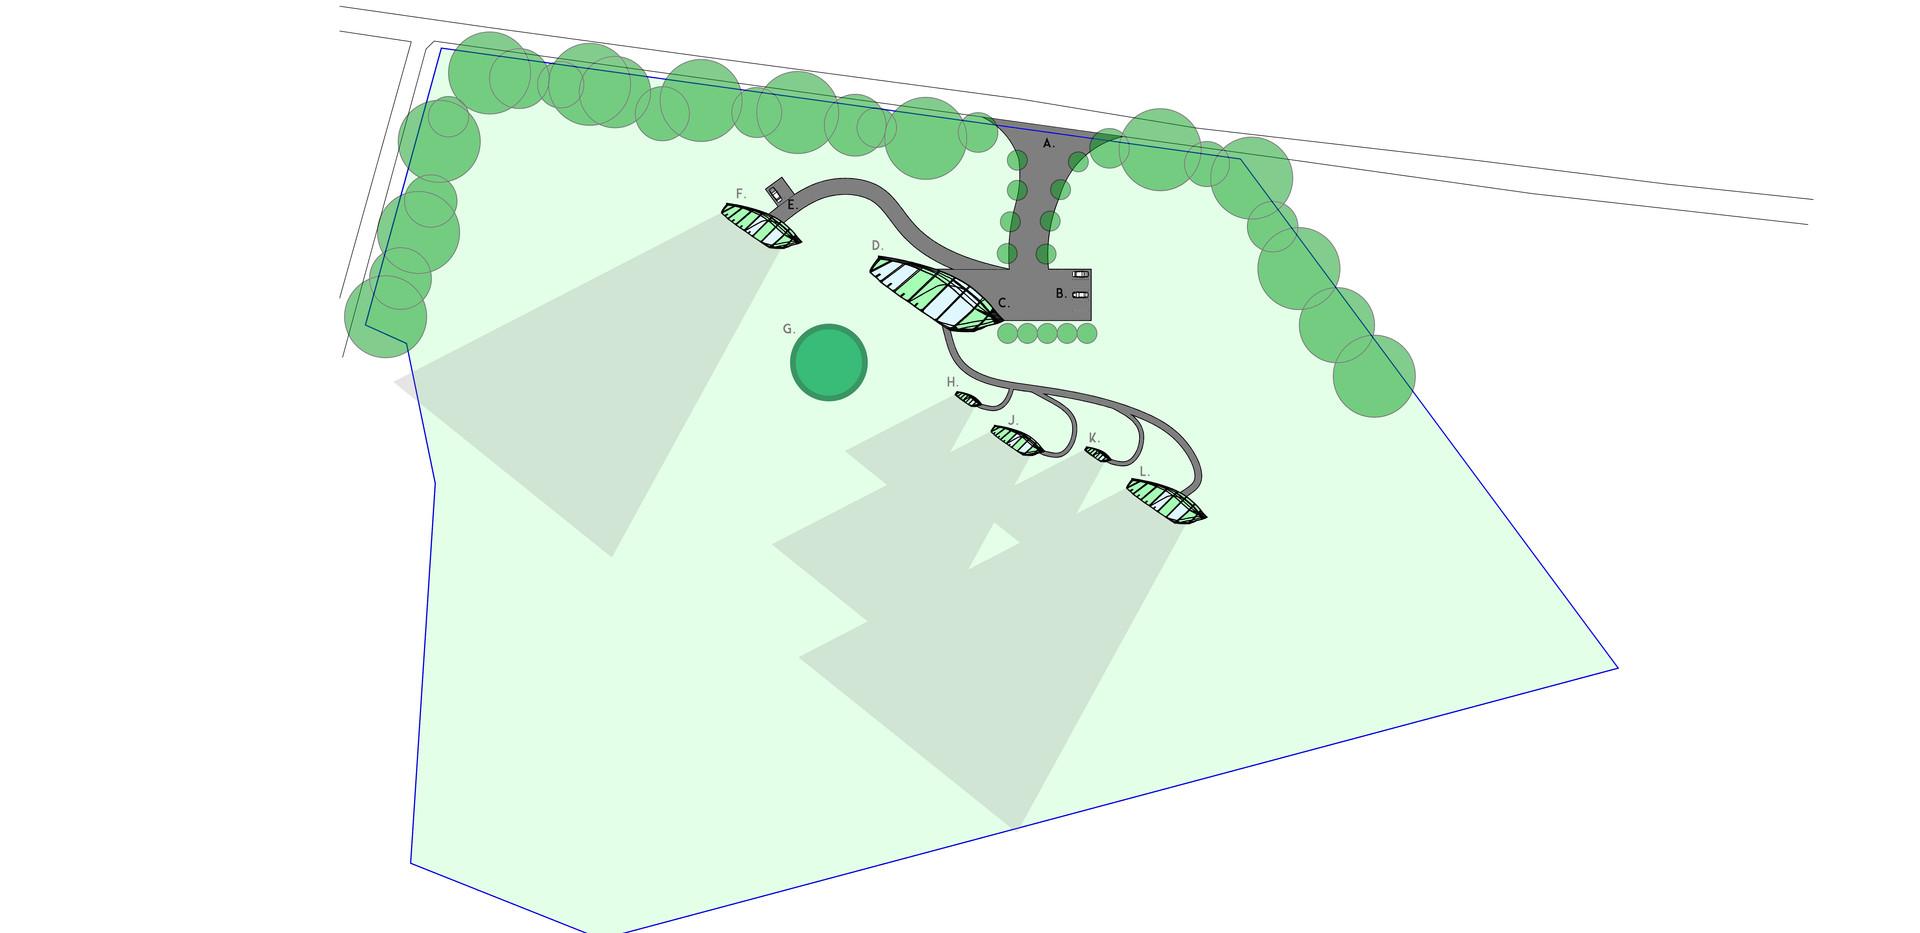 003 - A2 Site Plan.jpg